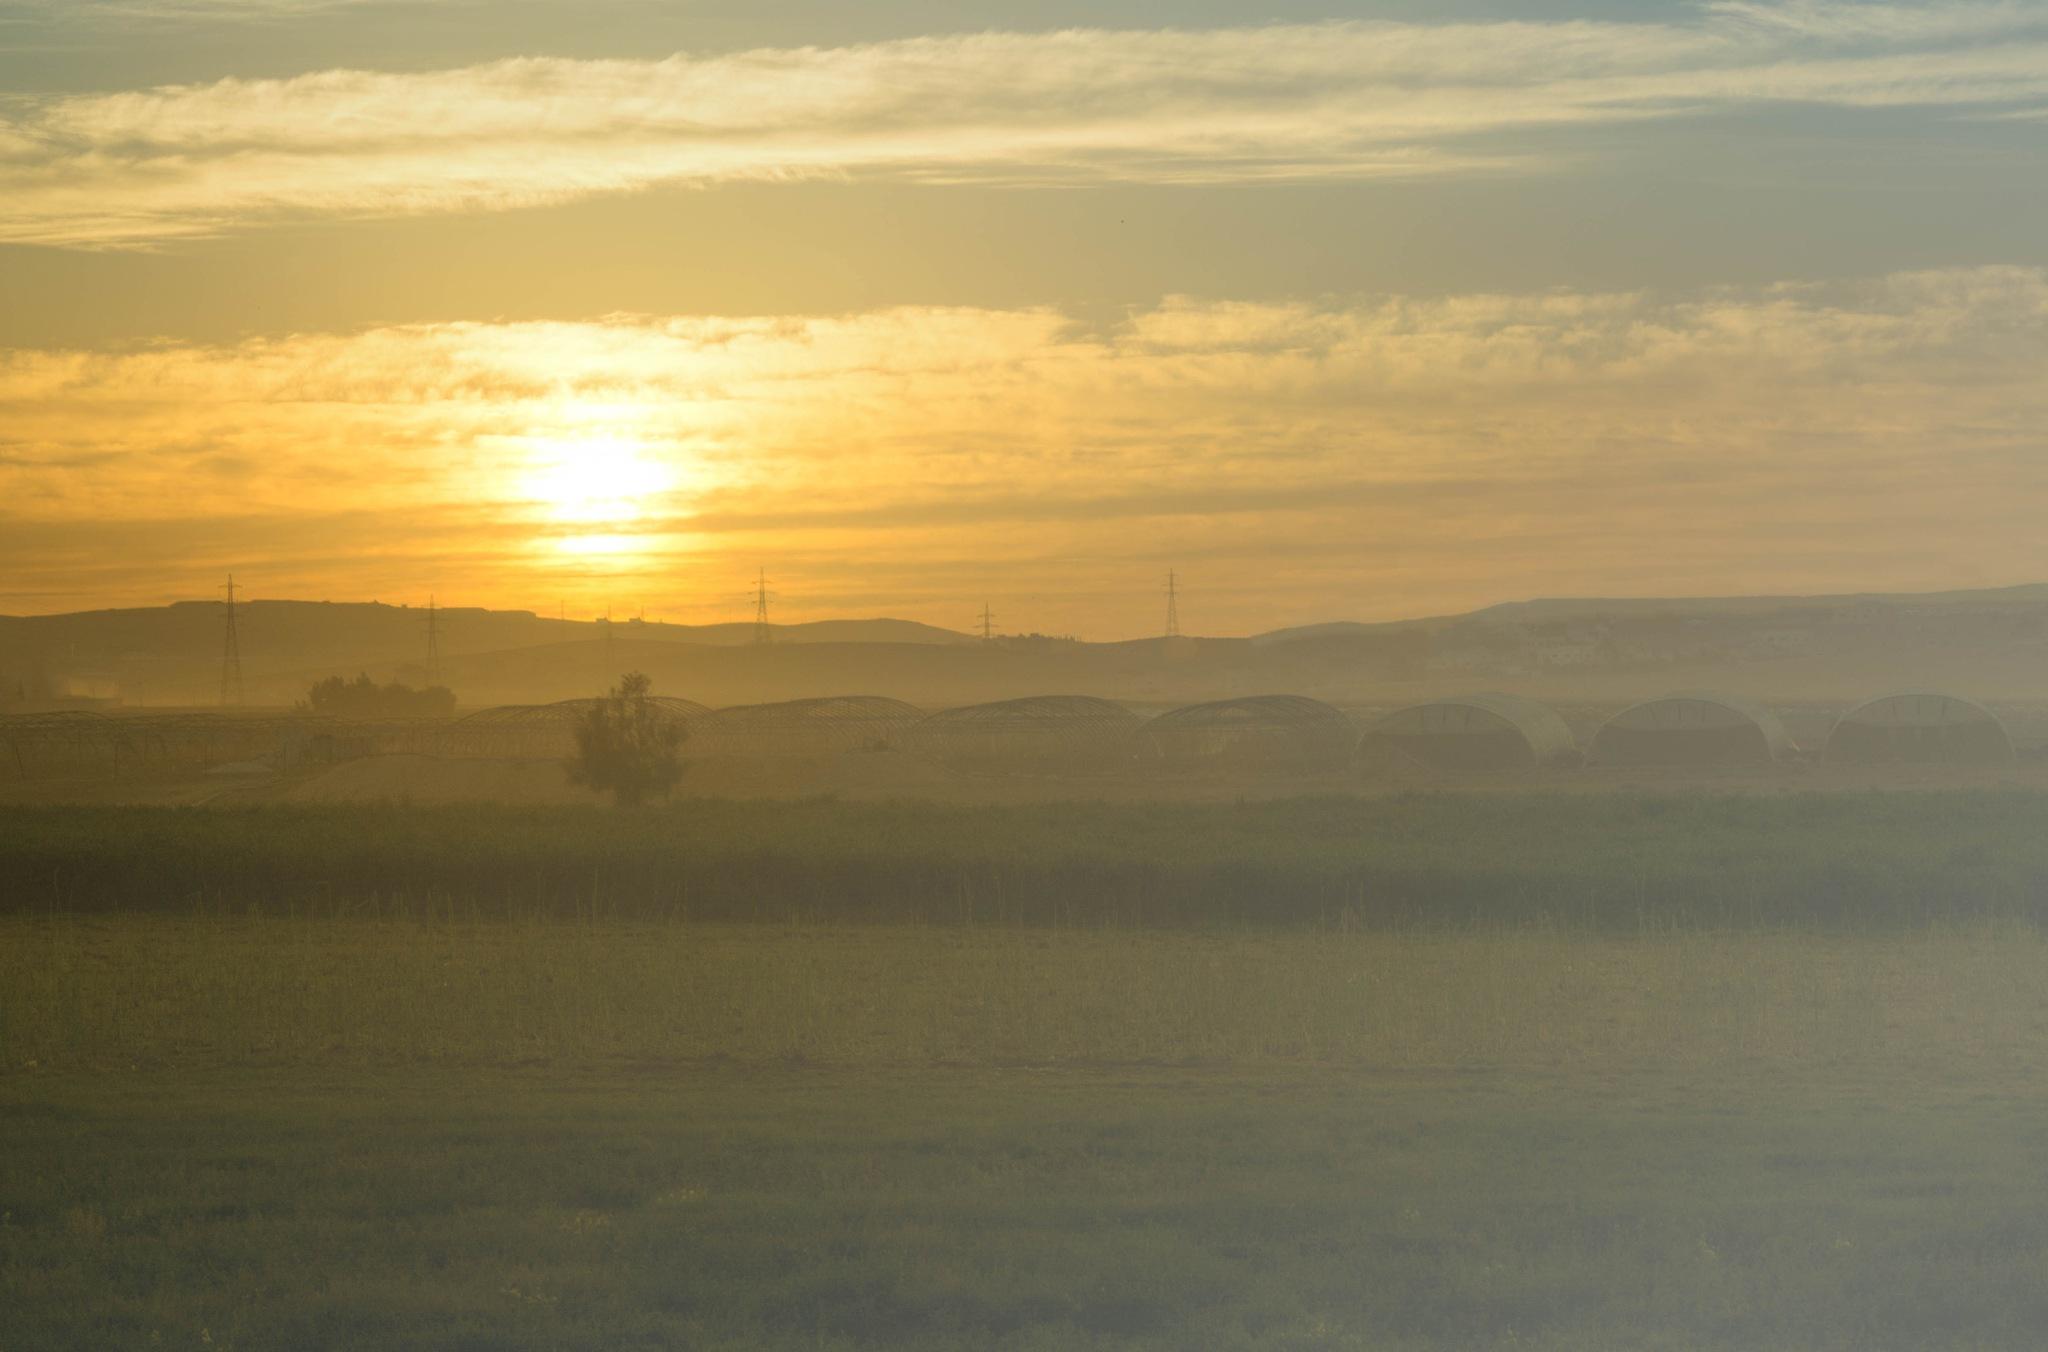 Sunrise by Alaa